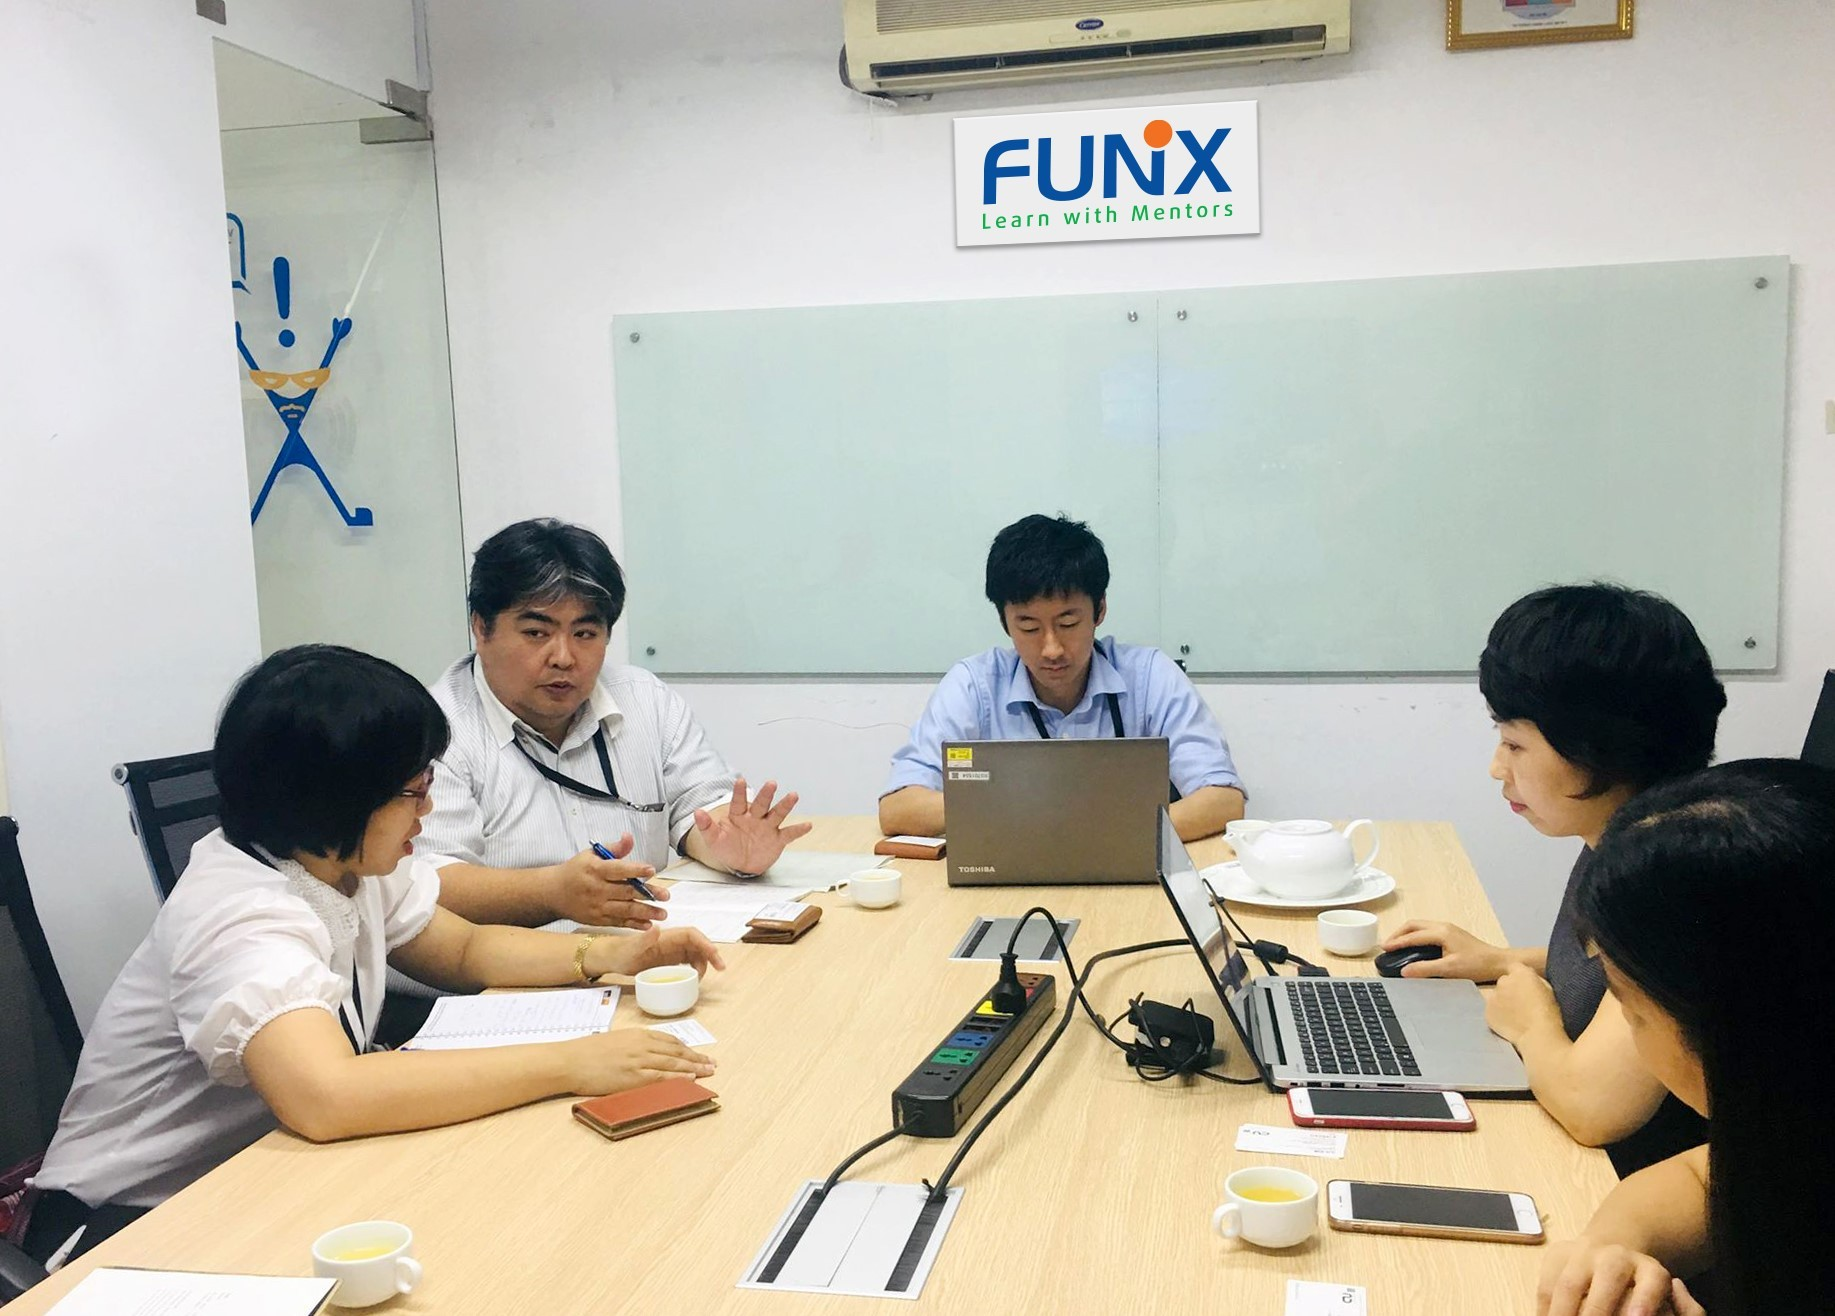 FUNiX